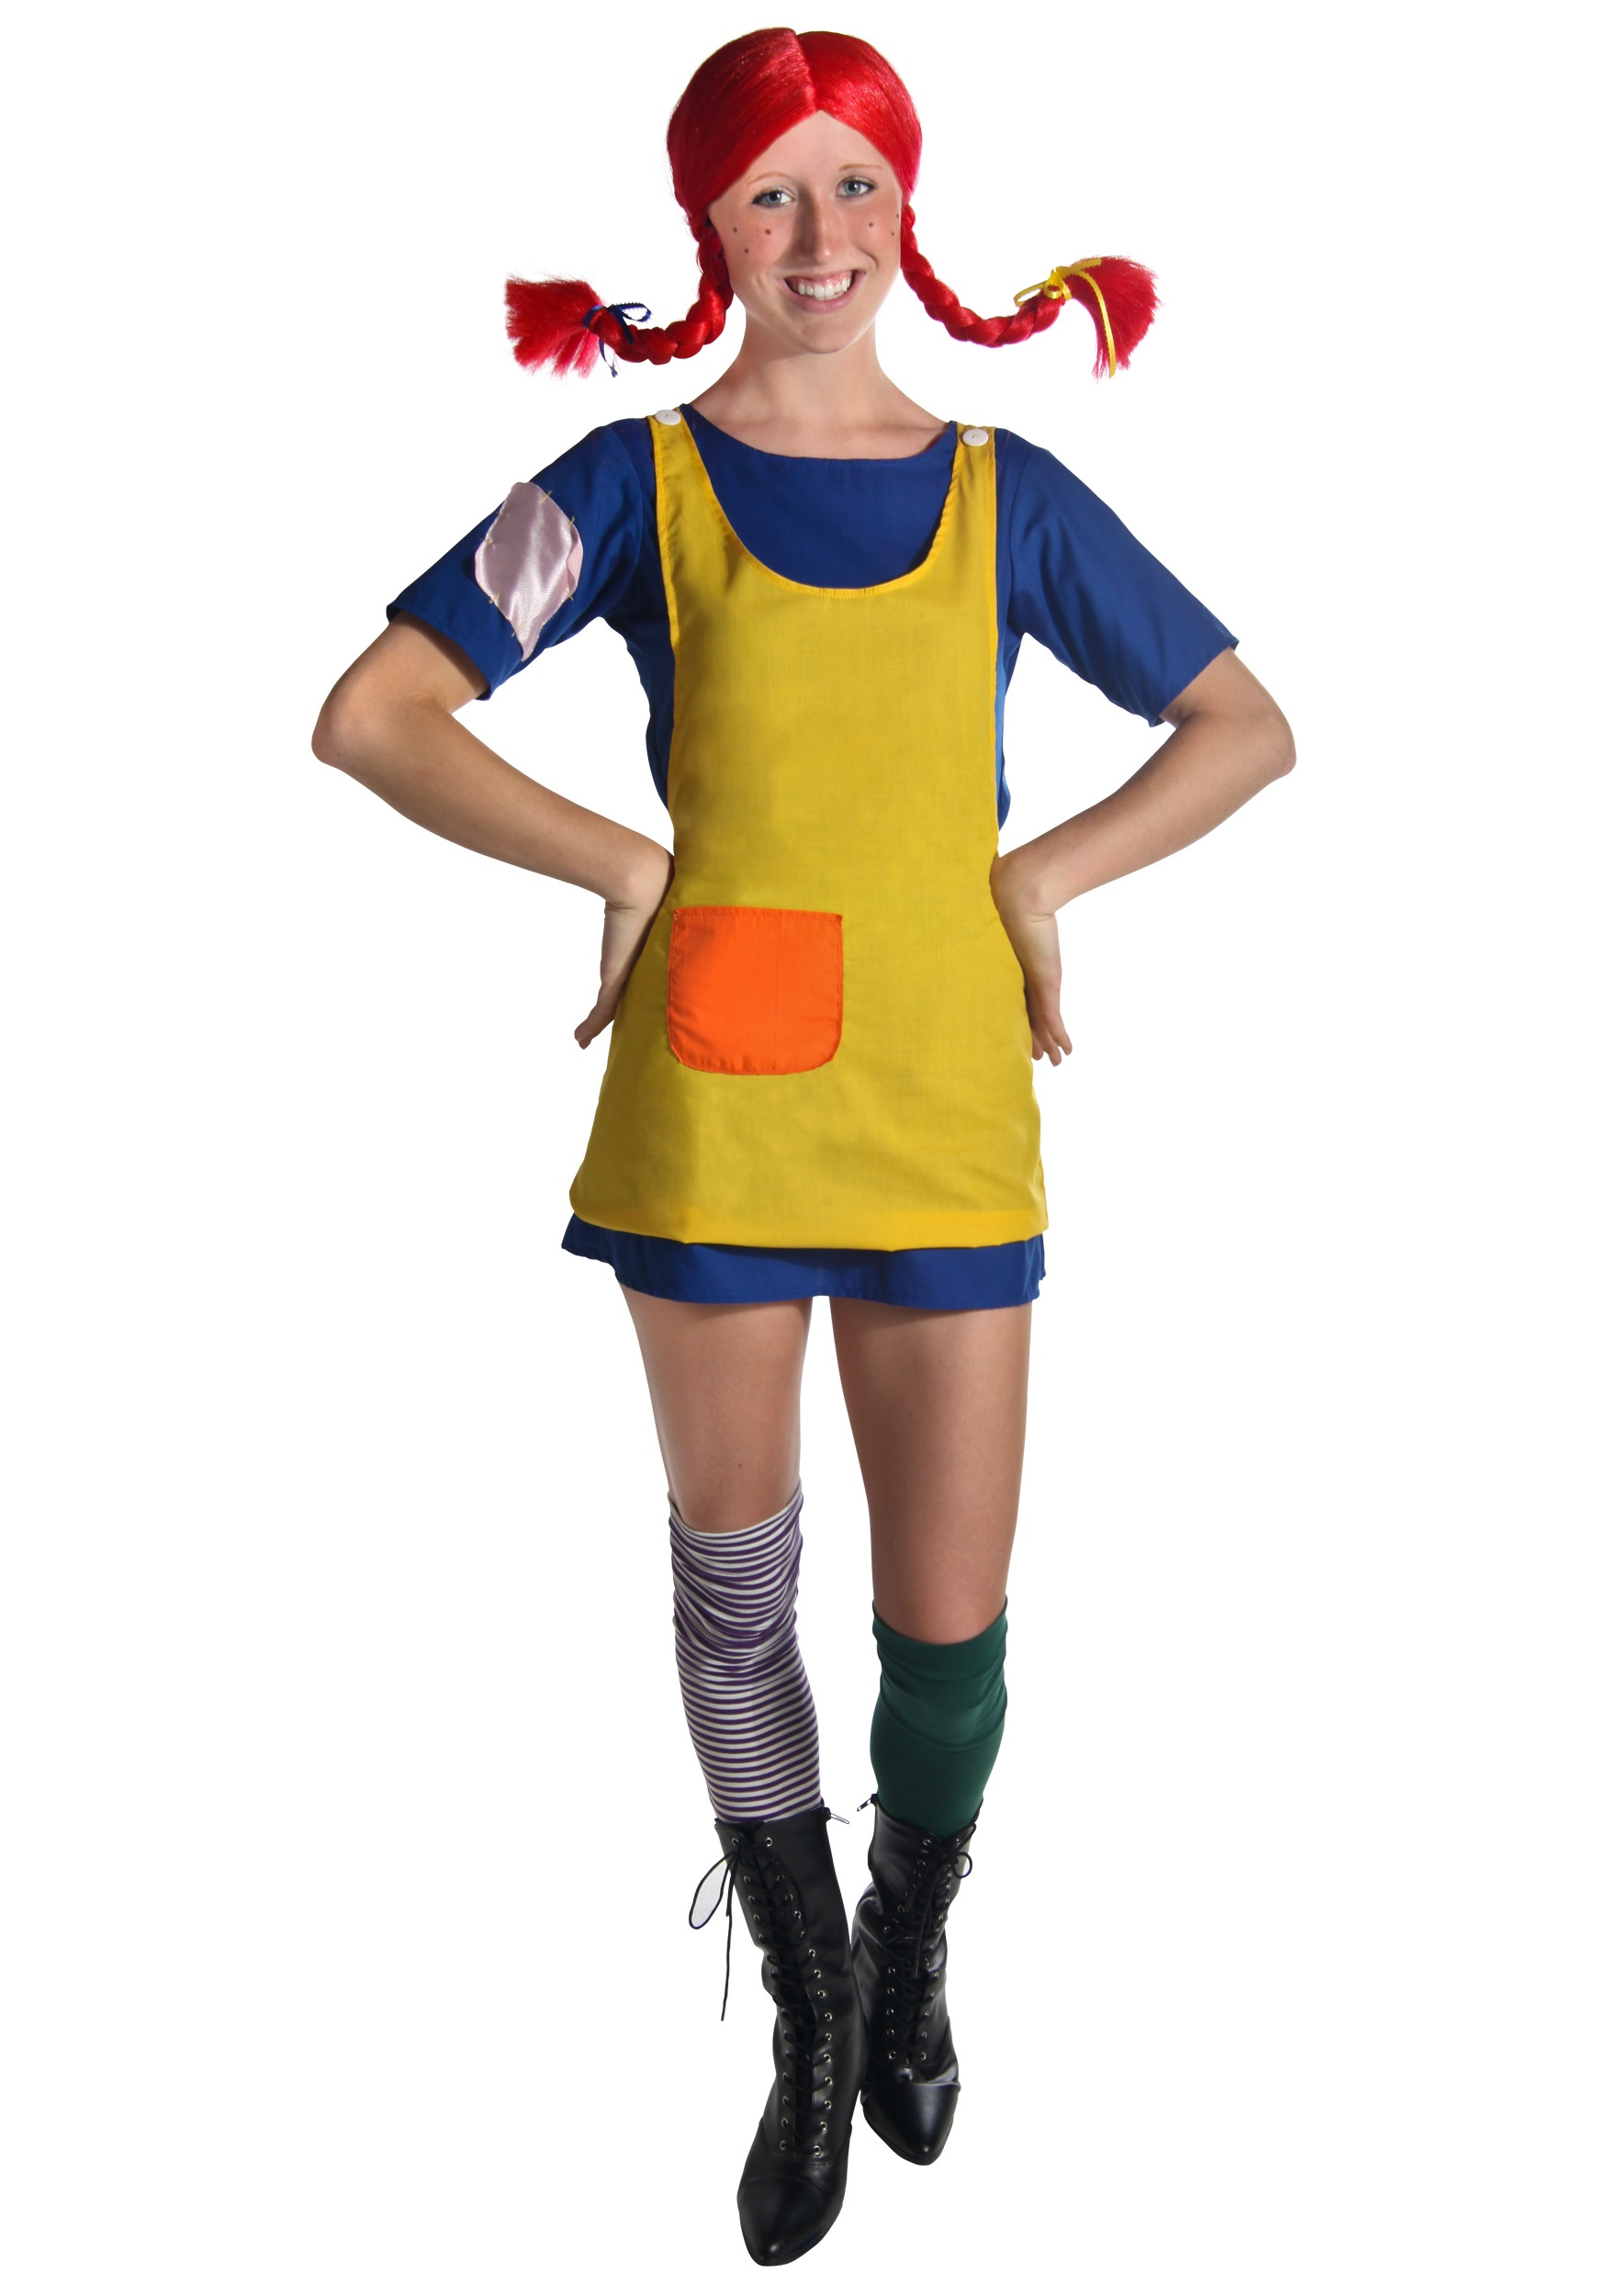 Costume Stocking 119